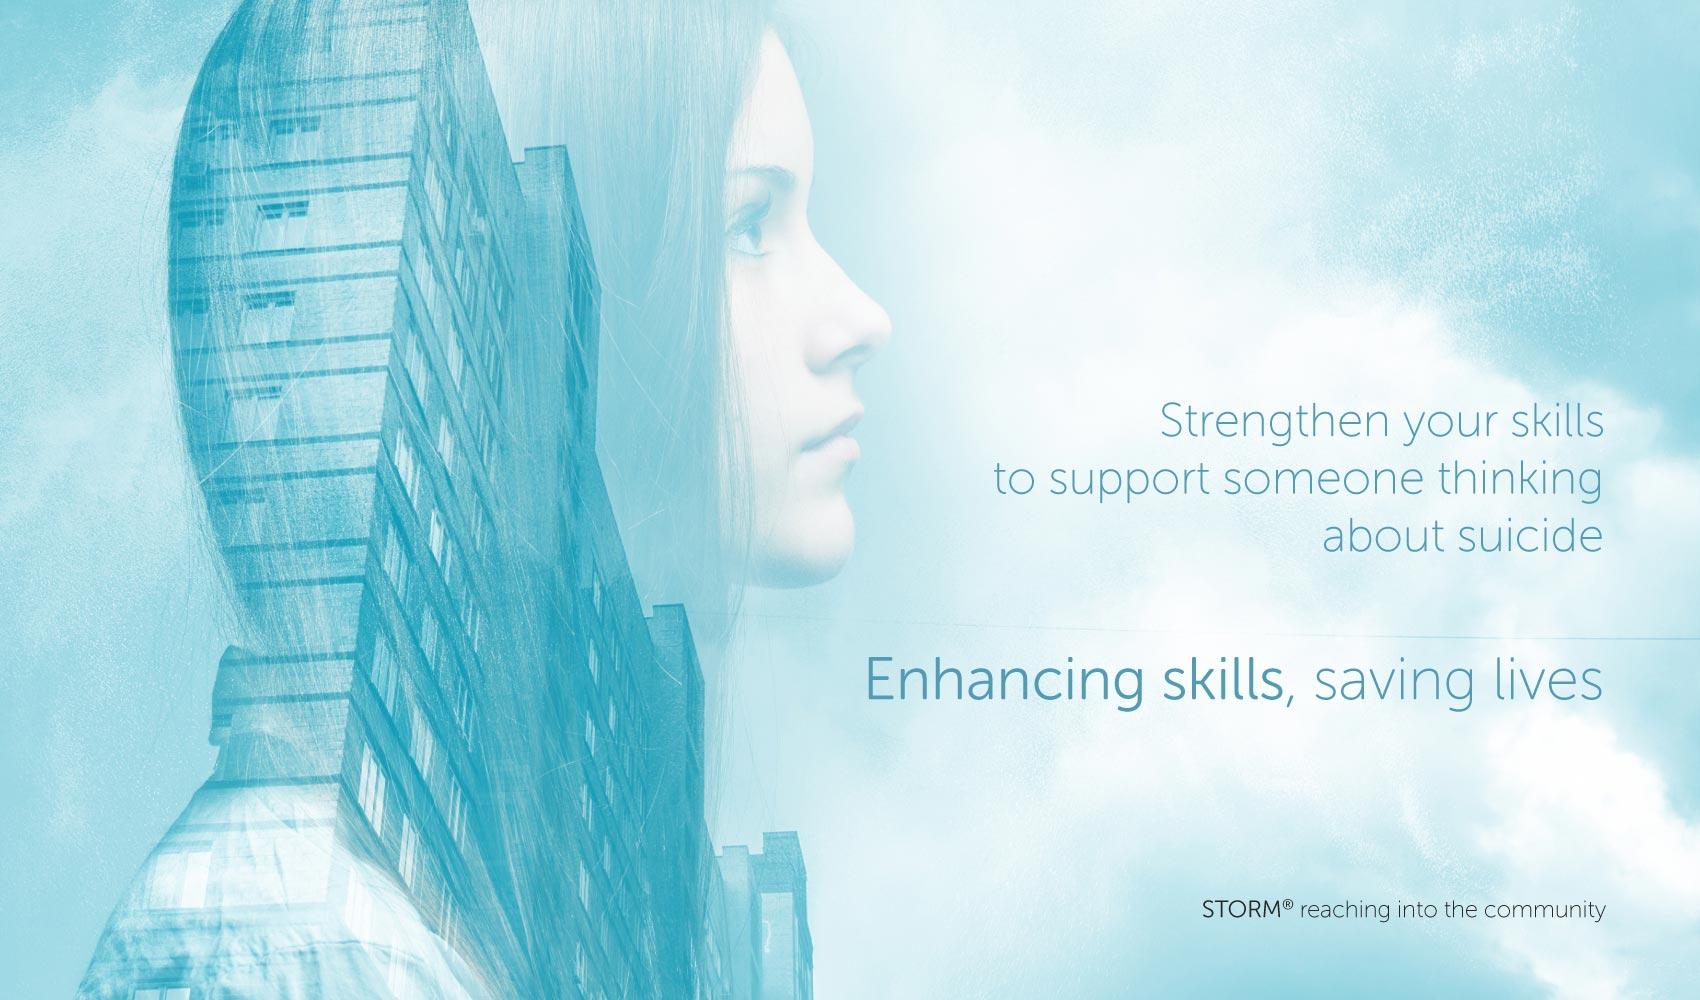 Storm Skills Training - Enhancing skills saving lives campaign